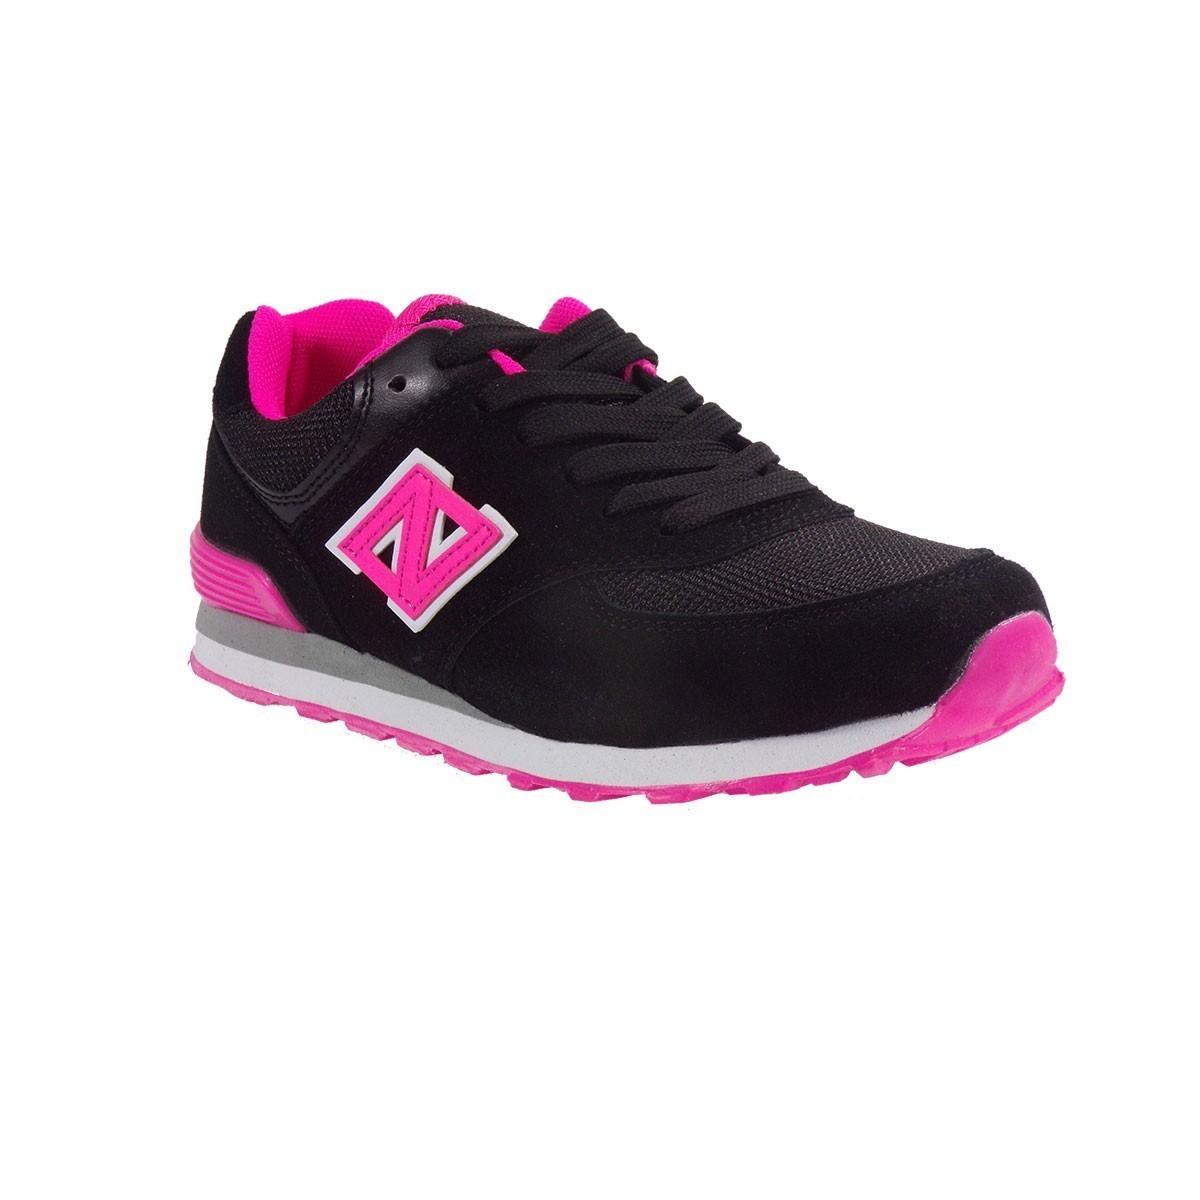 Bagiota Shoes Γυναικεία Παπούτσια Sneakers Αθλητικά L-574-4 Mαύρο-Ροζ